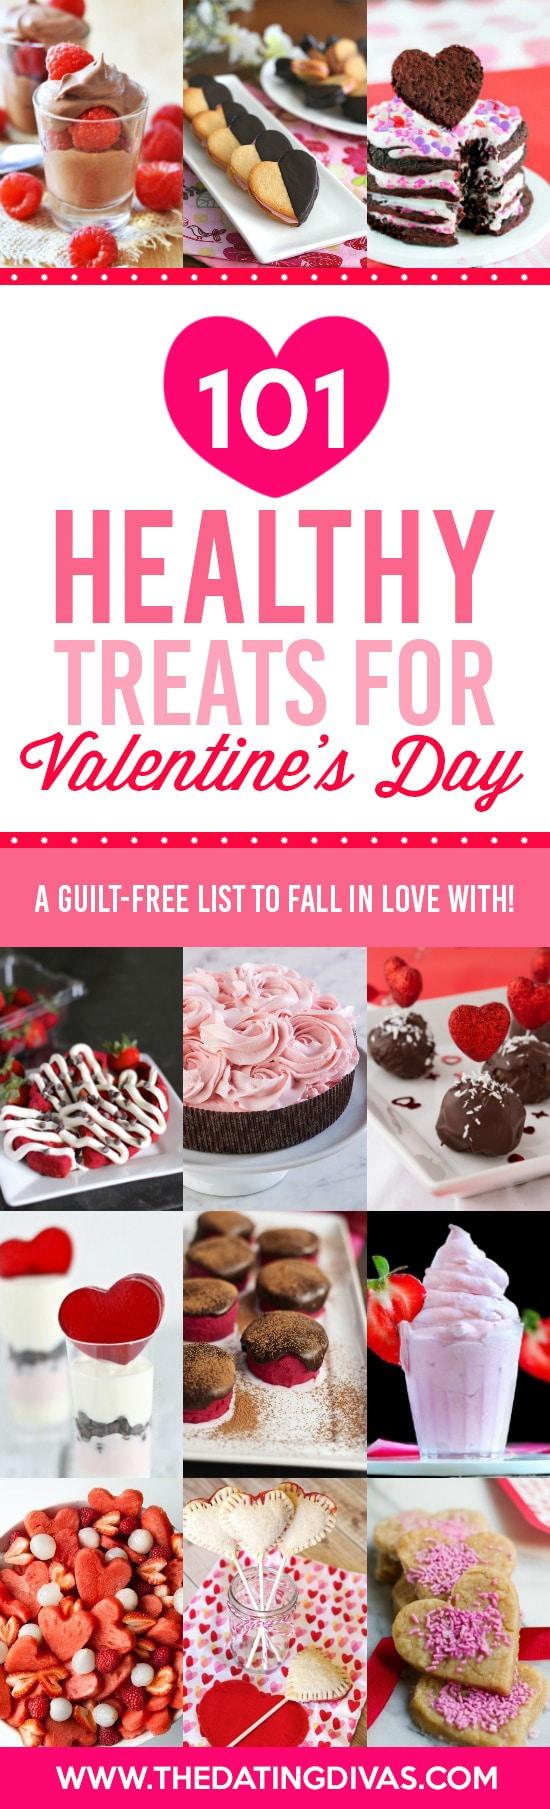 101 healthy treats for valentines day - Healthy Valentines Treats